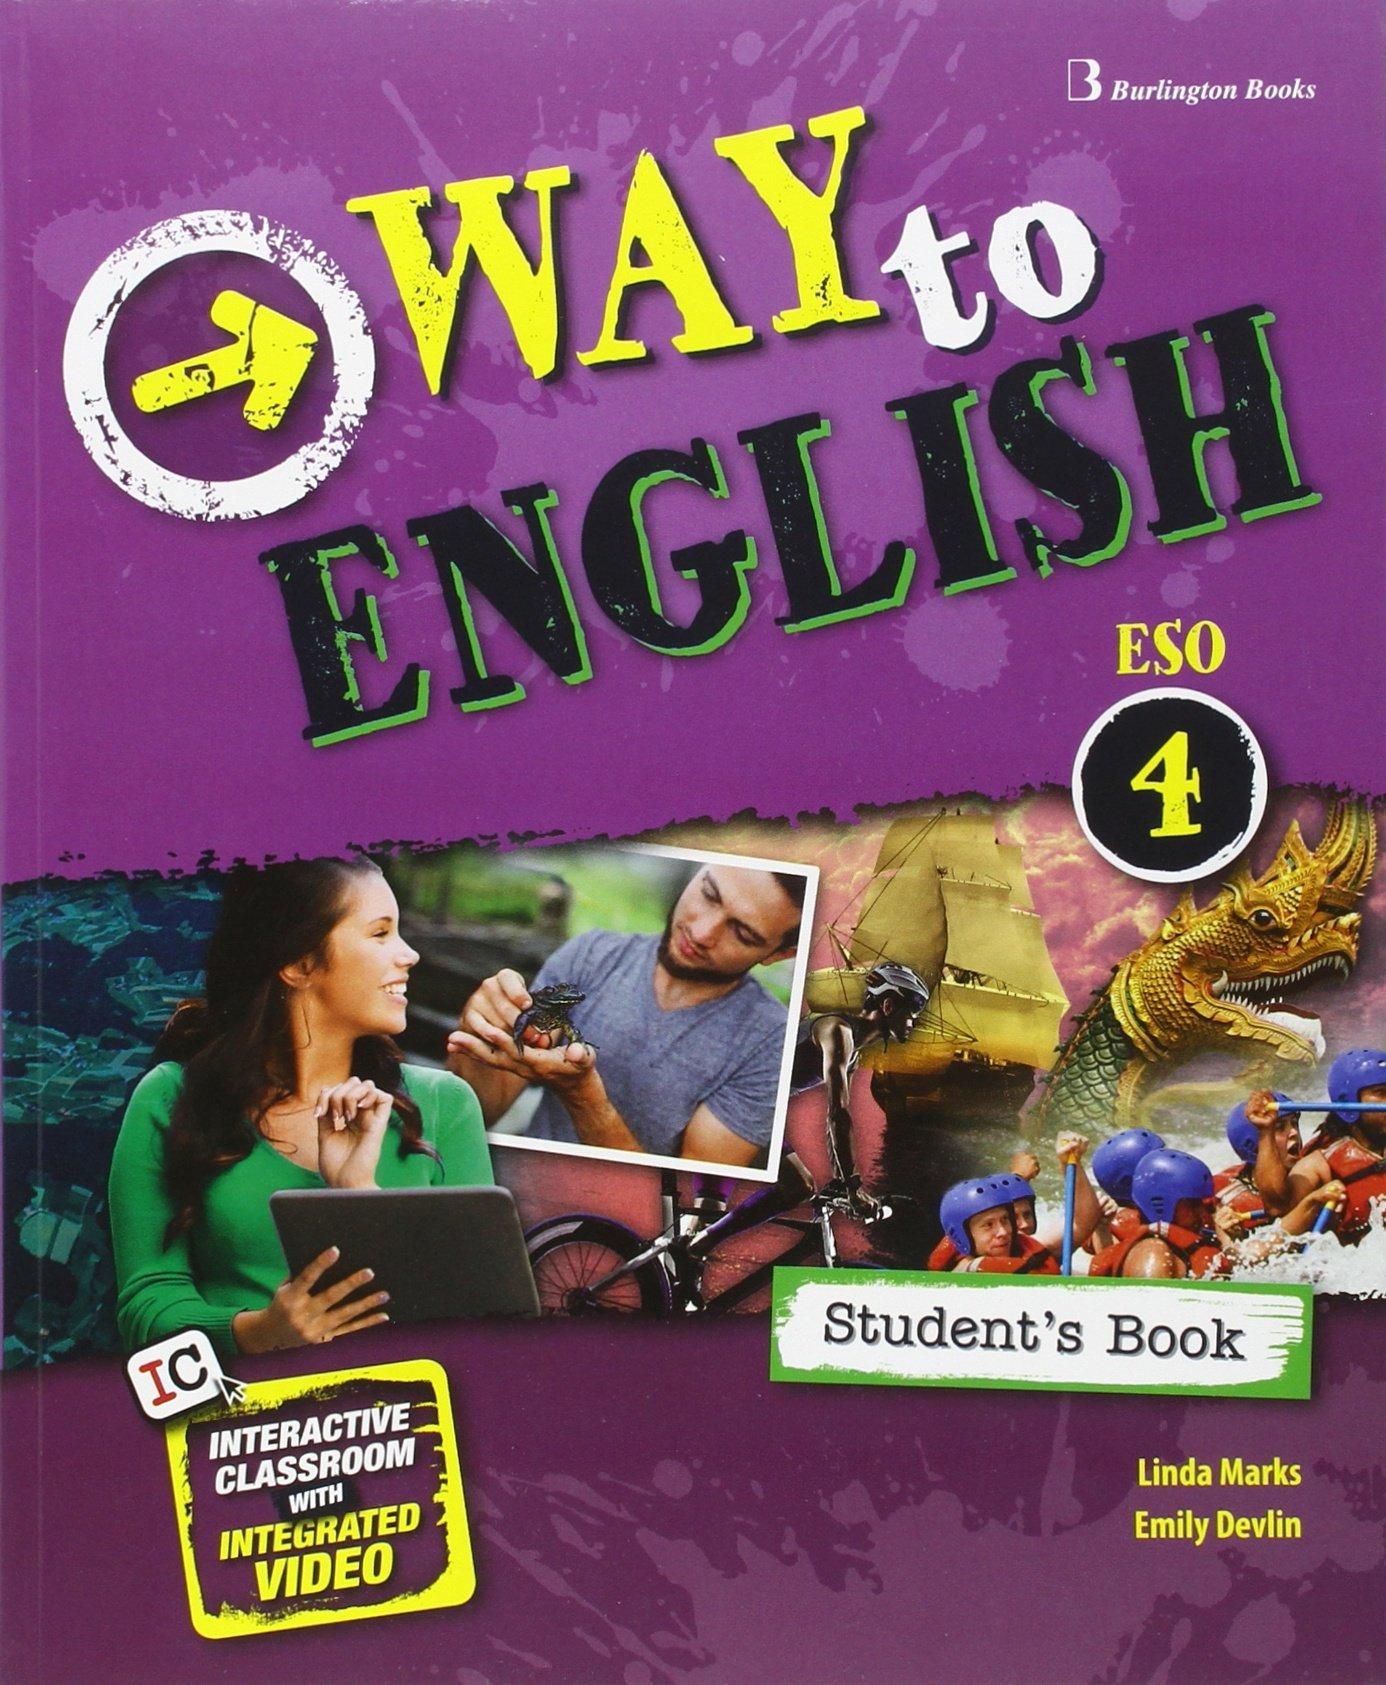 Inglés 4 ESO Burlington Books Soluciones 2020 / 2021